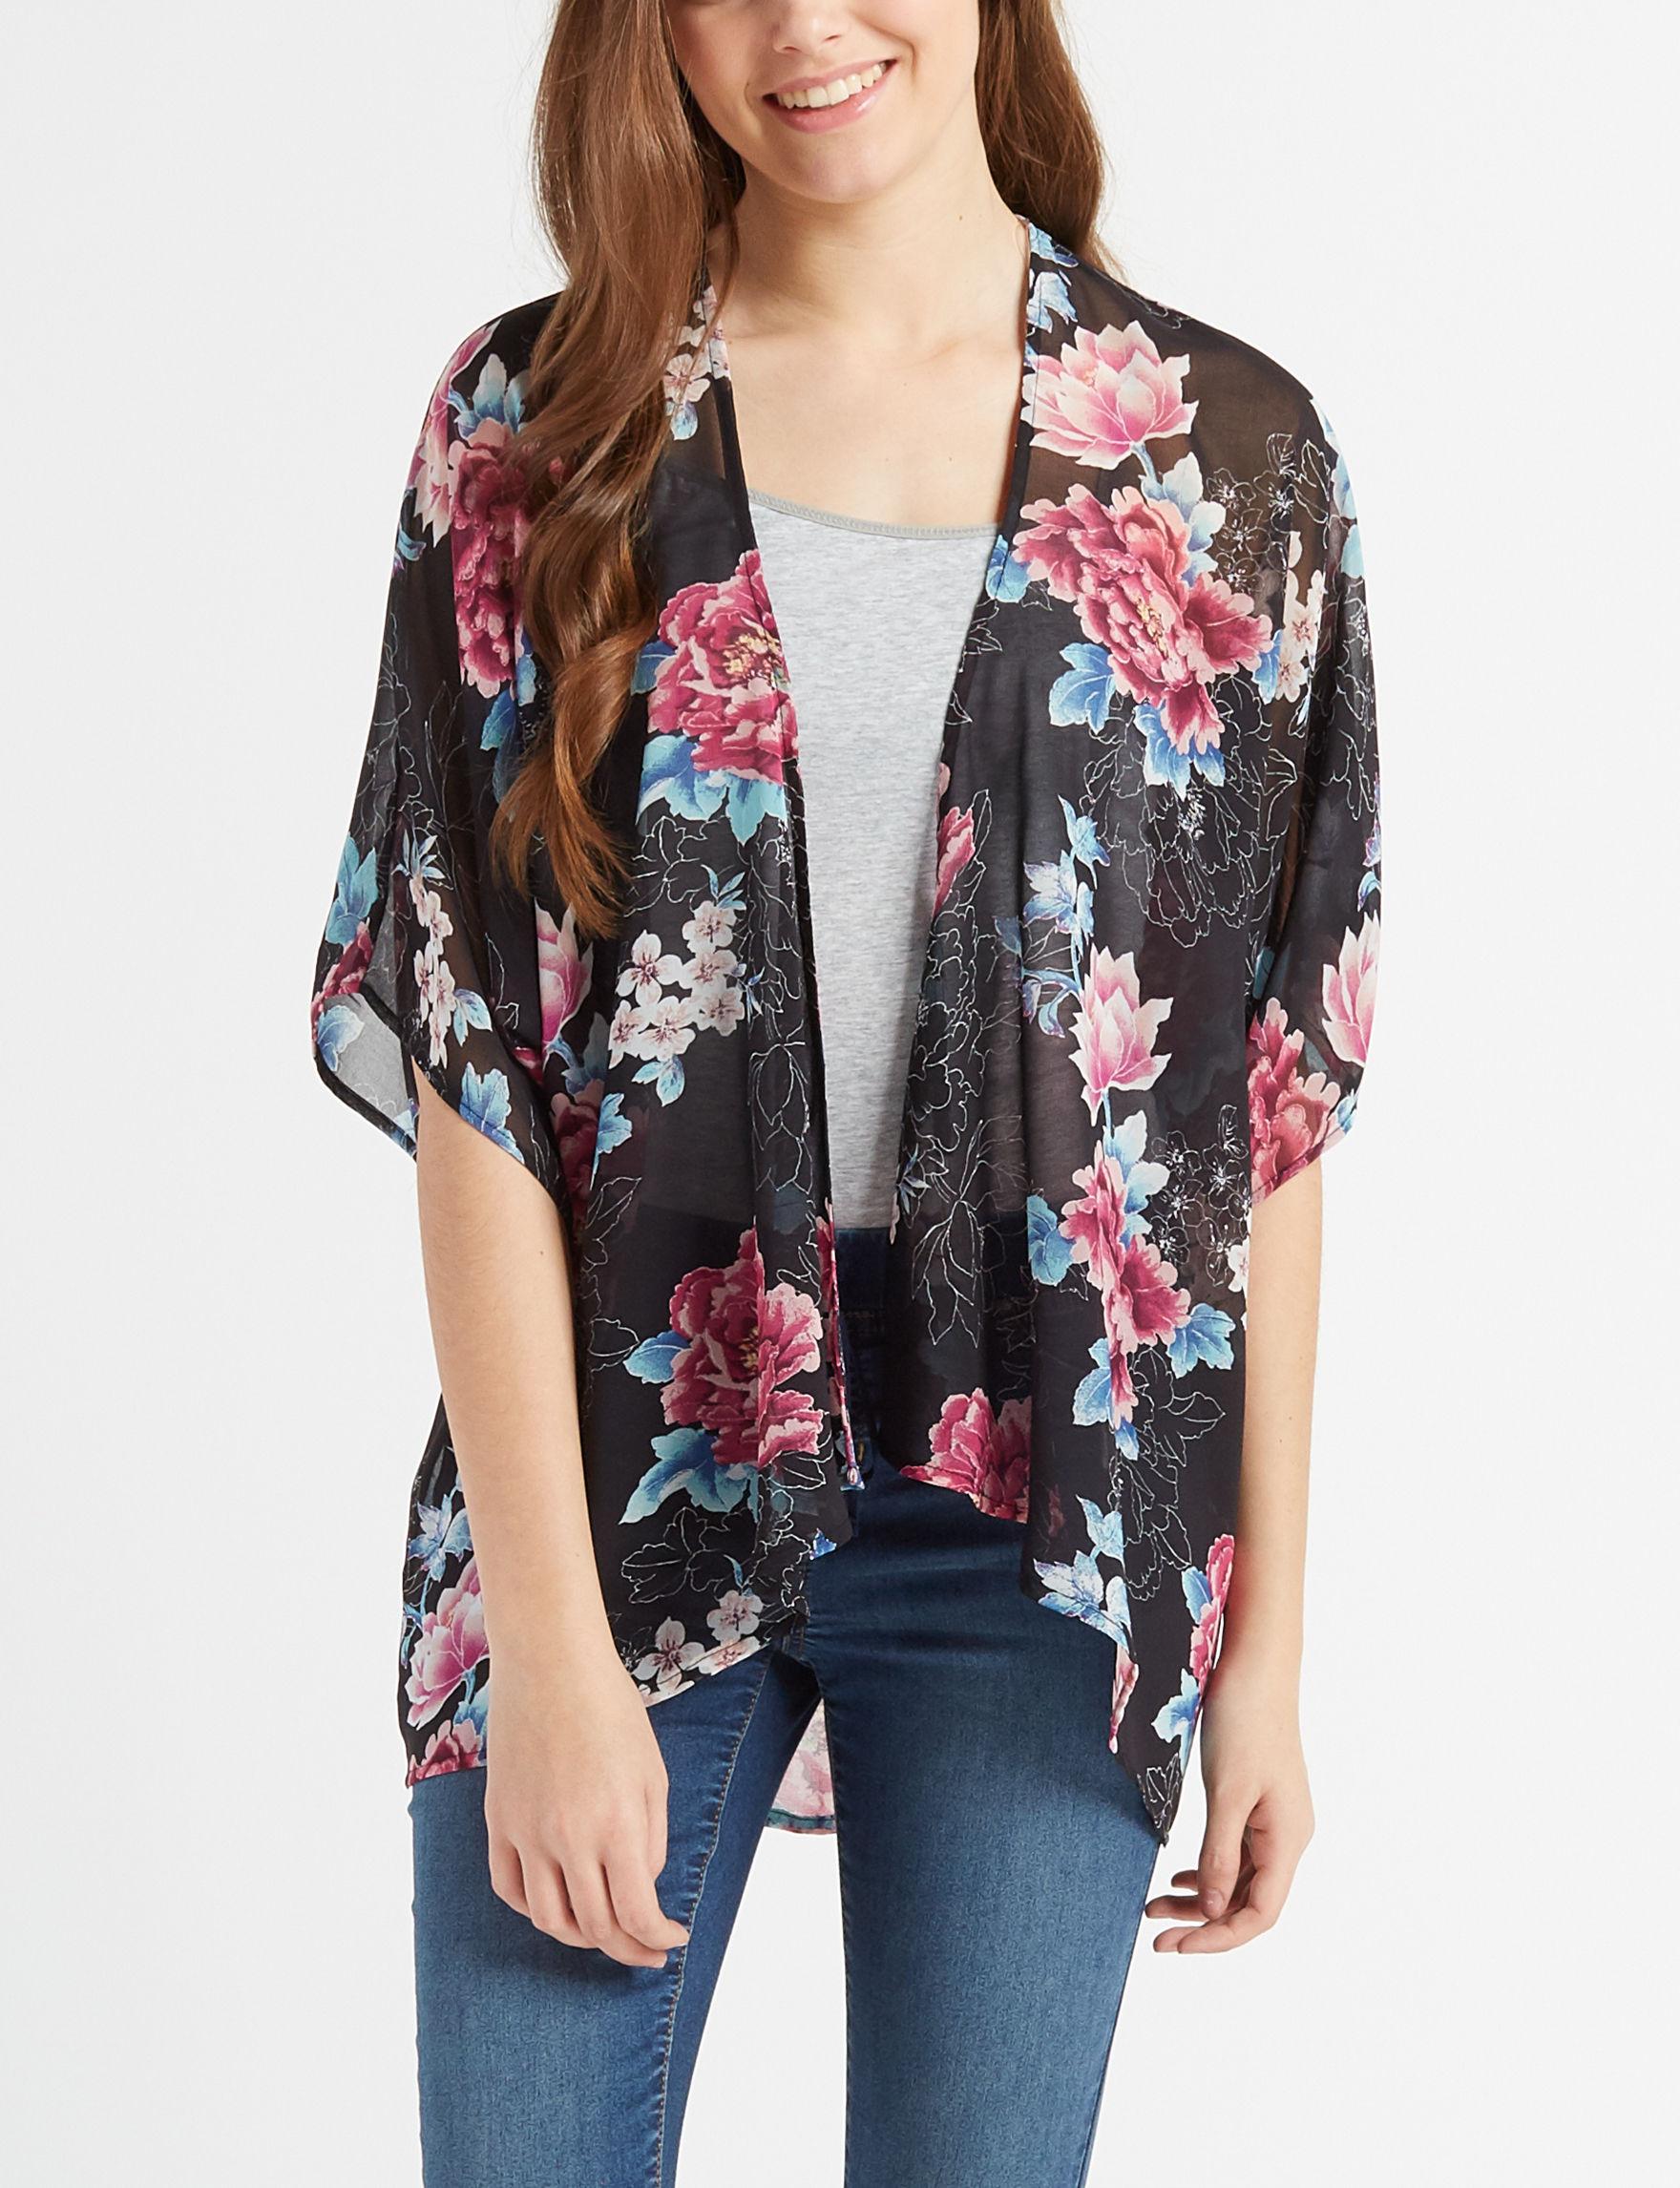 Liberty Love Black Floral Shirts & Blouses